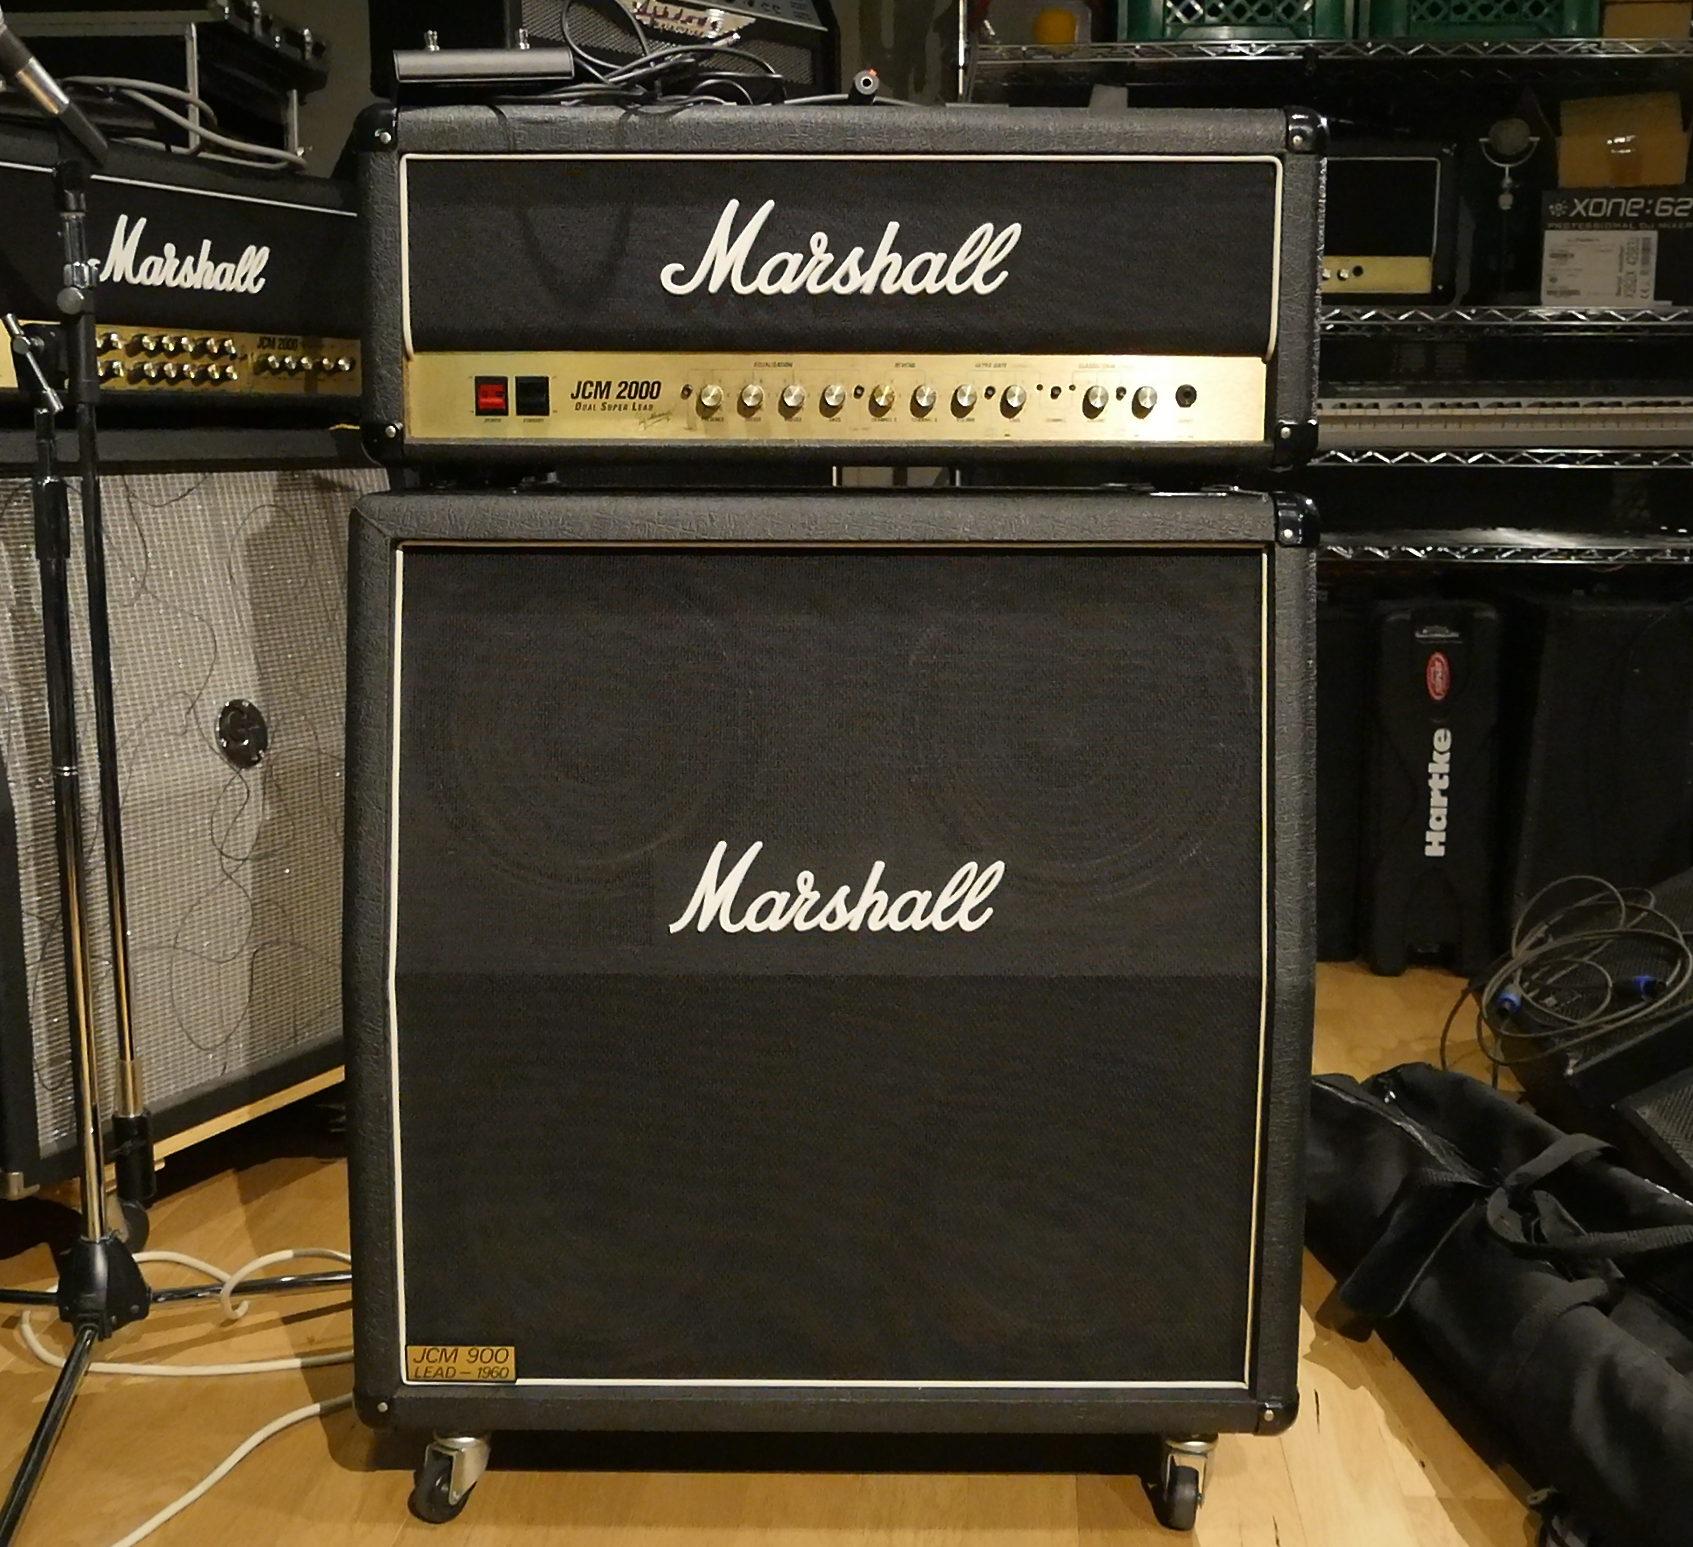 MarshallJCM2000DSL